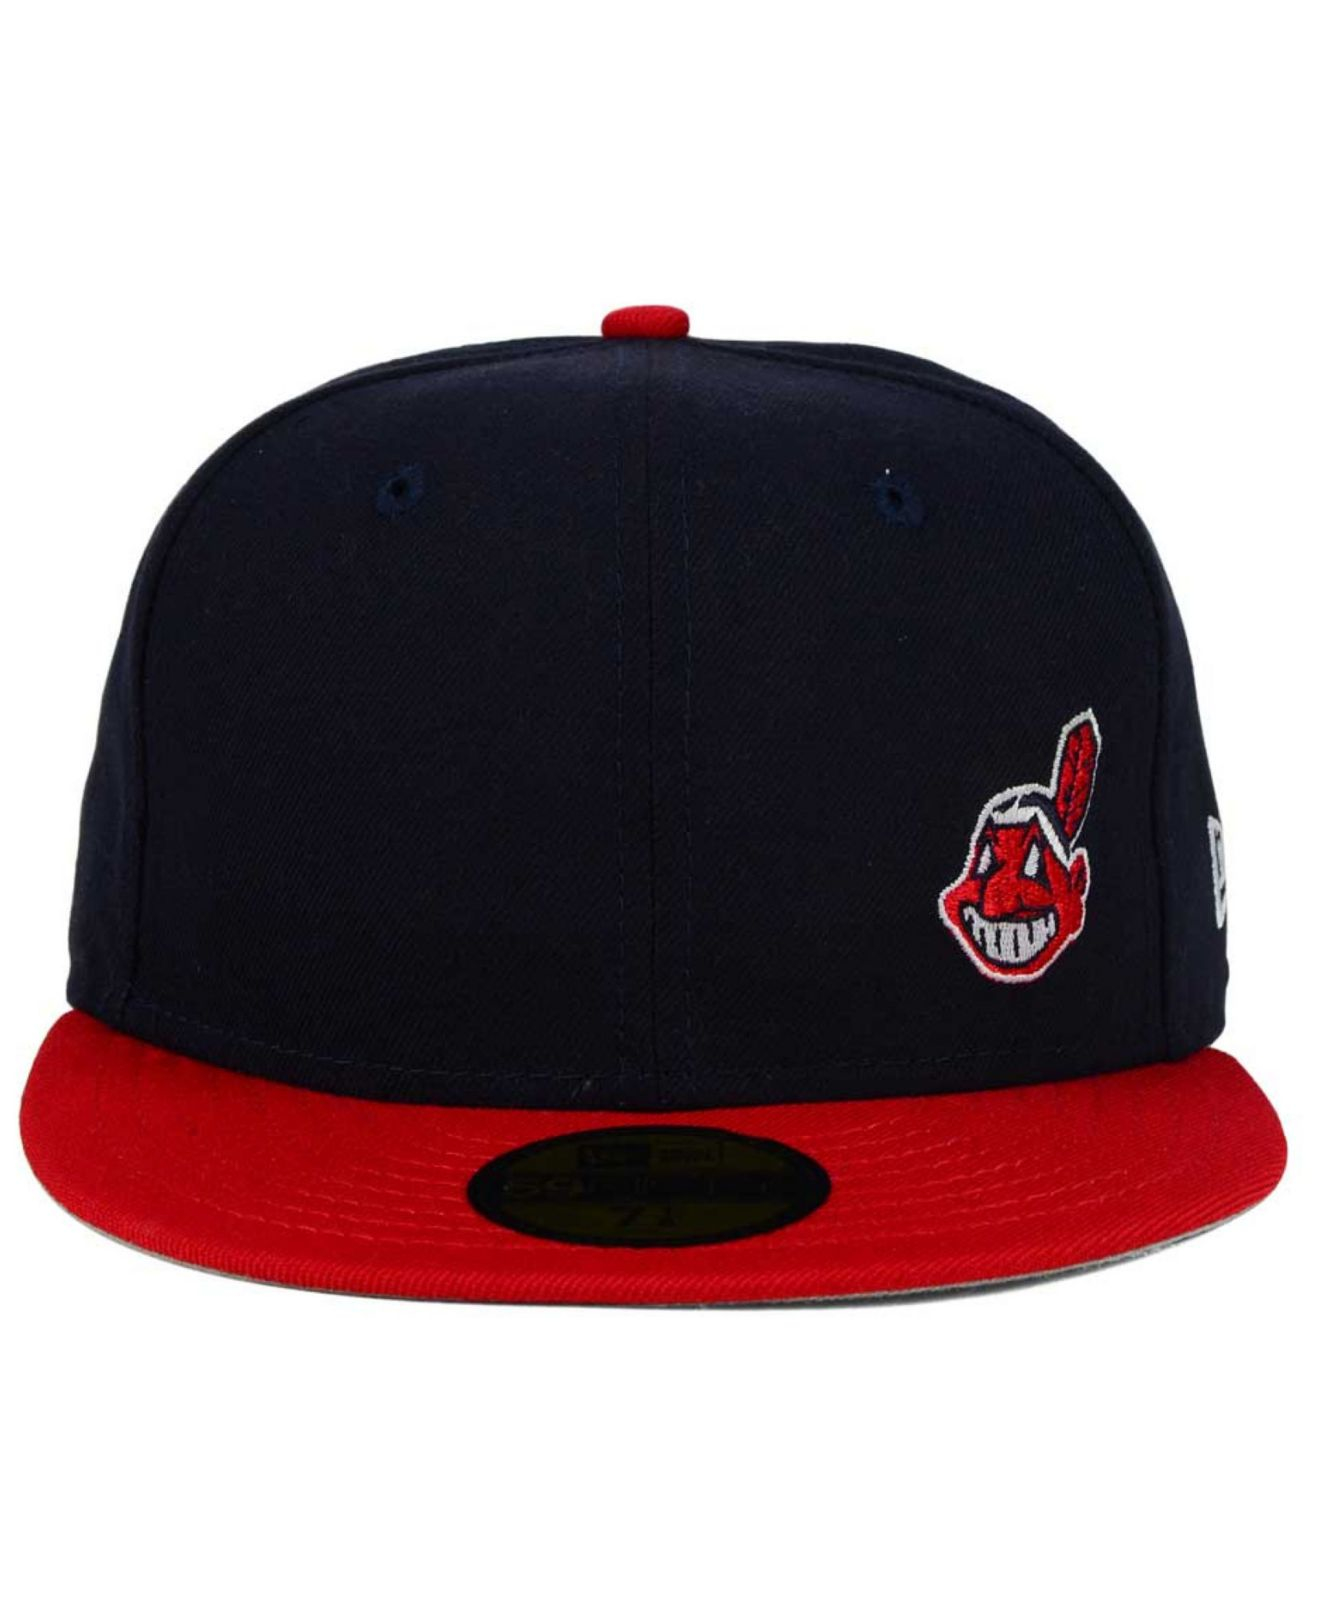 73d9a2290c2 Lyst - KTZ Cleveland Indians Smalls 59fifty Cap in Blue for Men